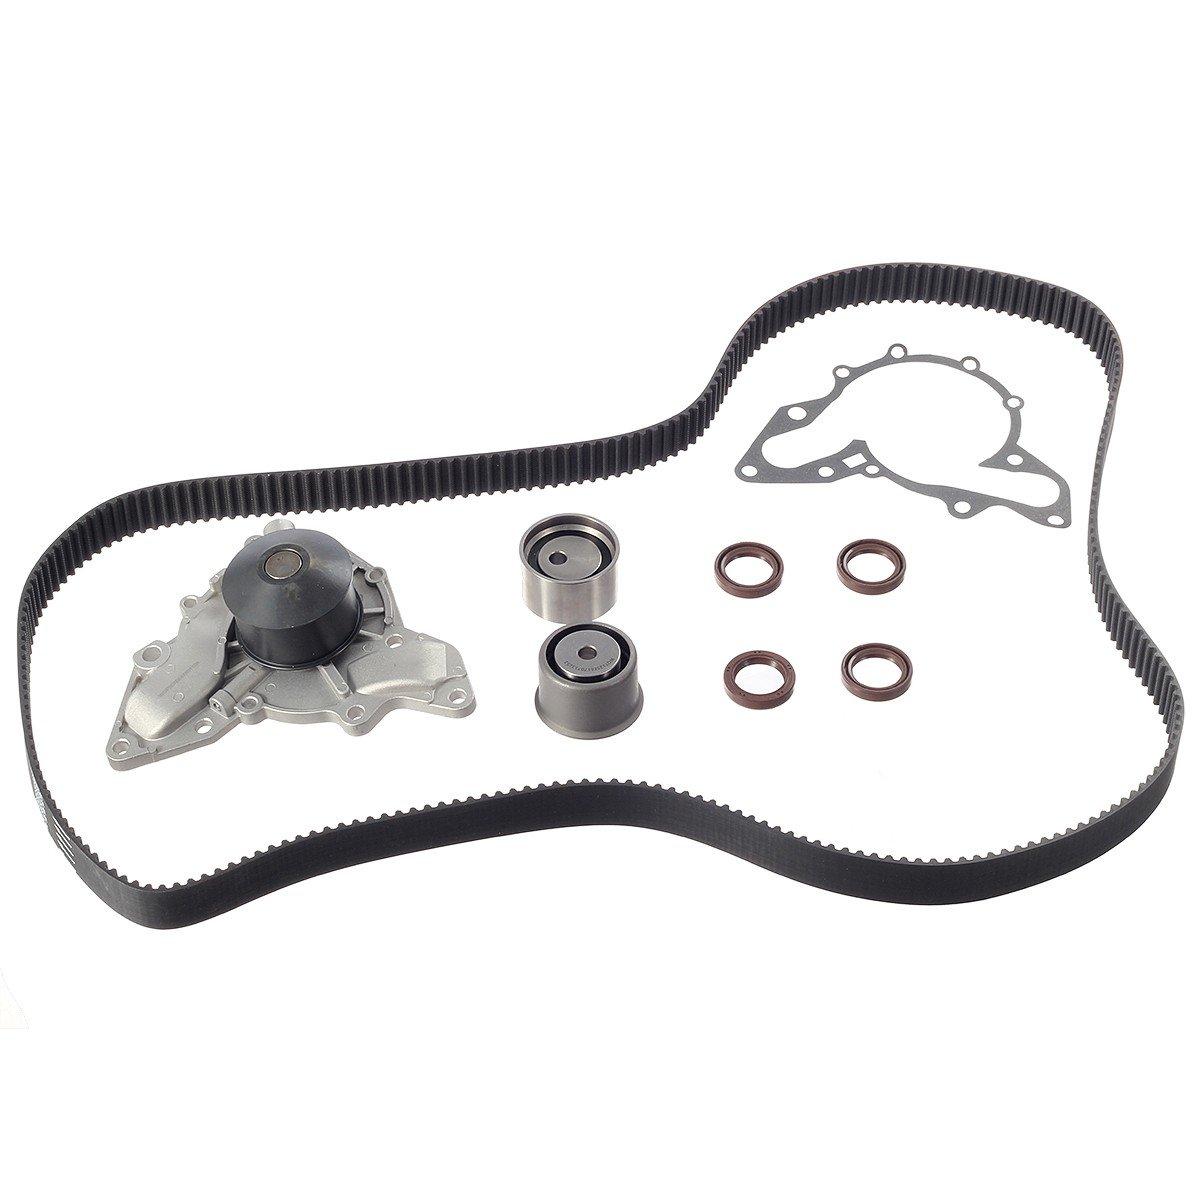 Tbk323wp Timing Belt Water Pump Kit For Kia Sedona 05 Mazda 6 Amanti 35l 3497cc V6 Dohc Hyundai Xg350 Santa Fe G6cu Automotive